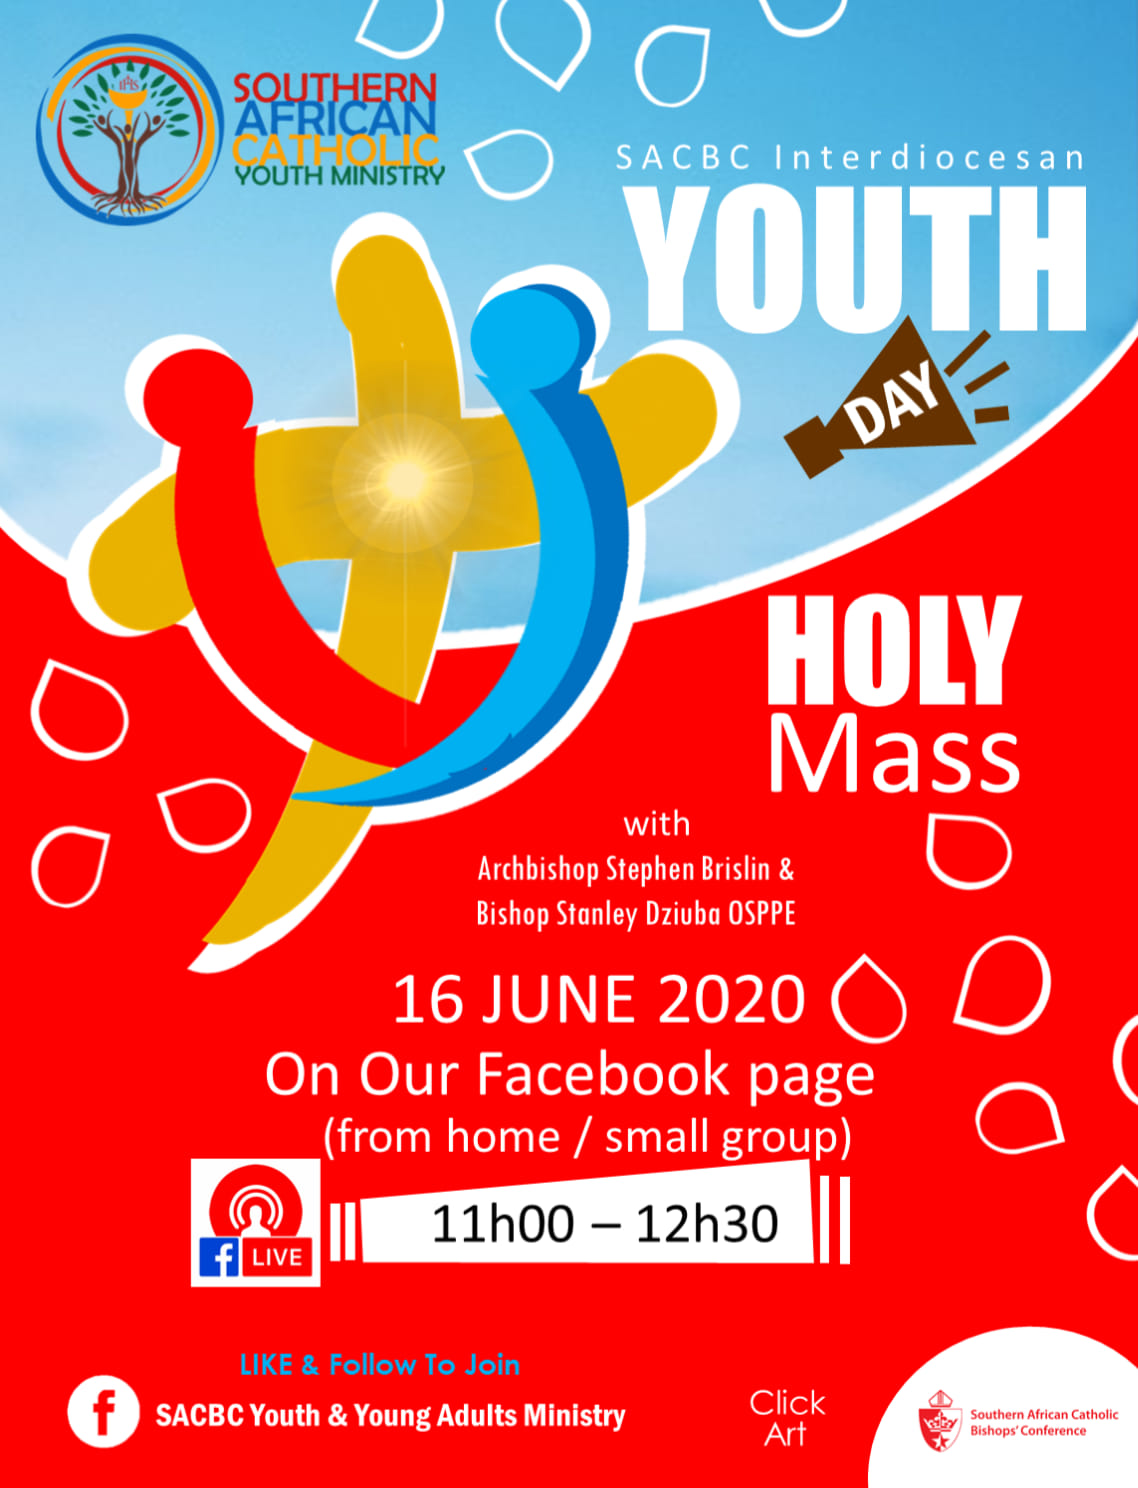 Youth Day Celebration on @sacbcyouthministry